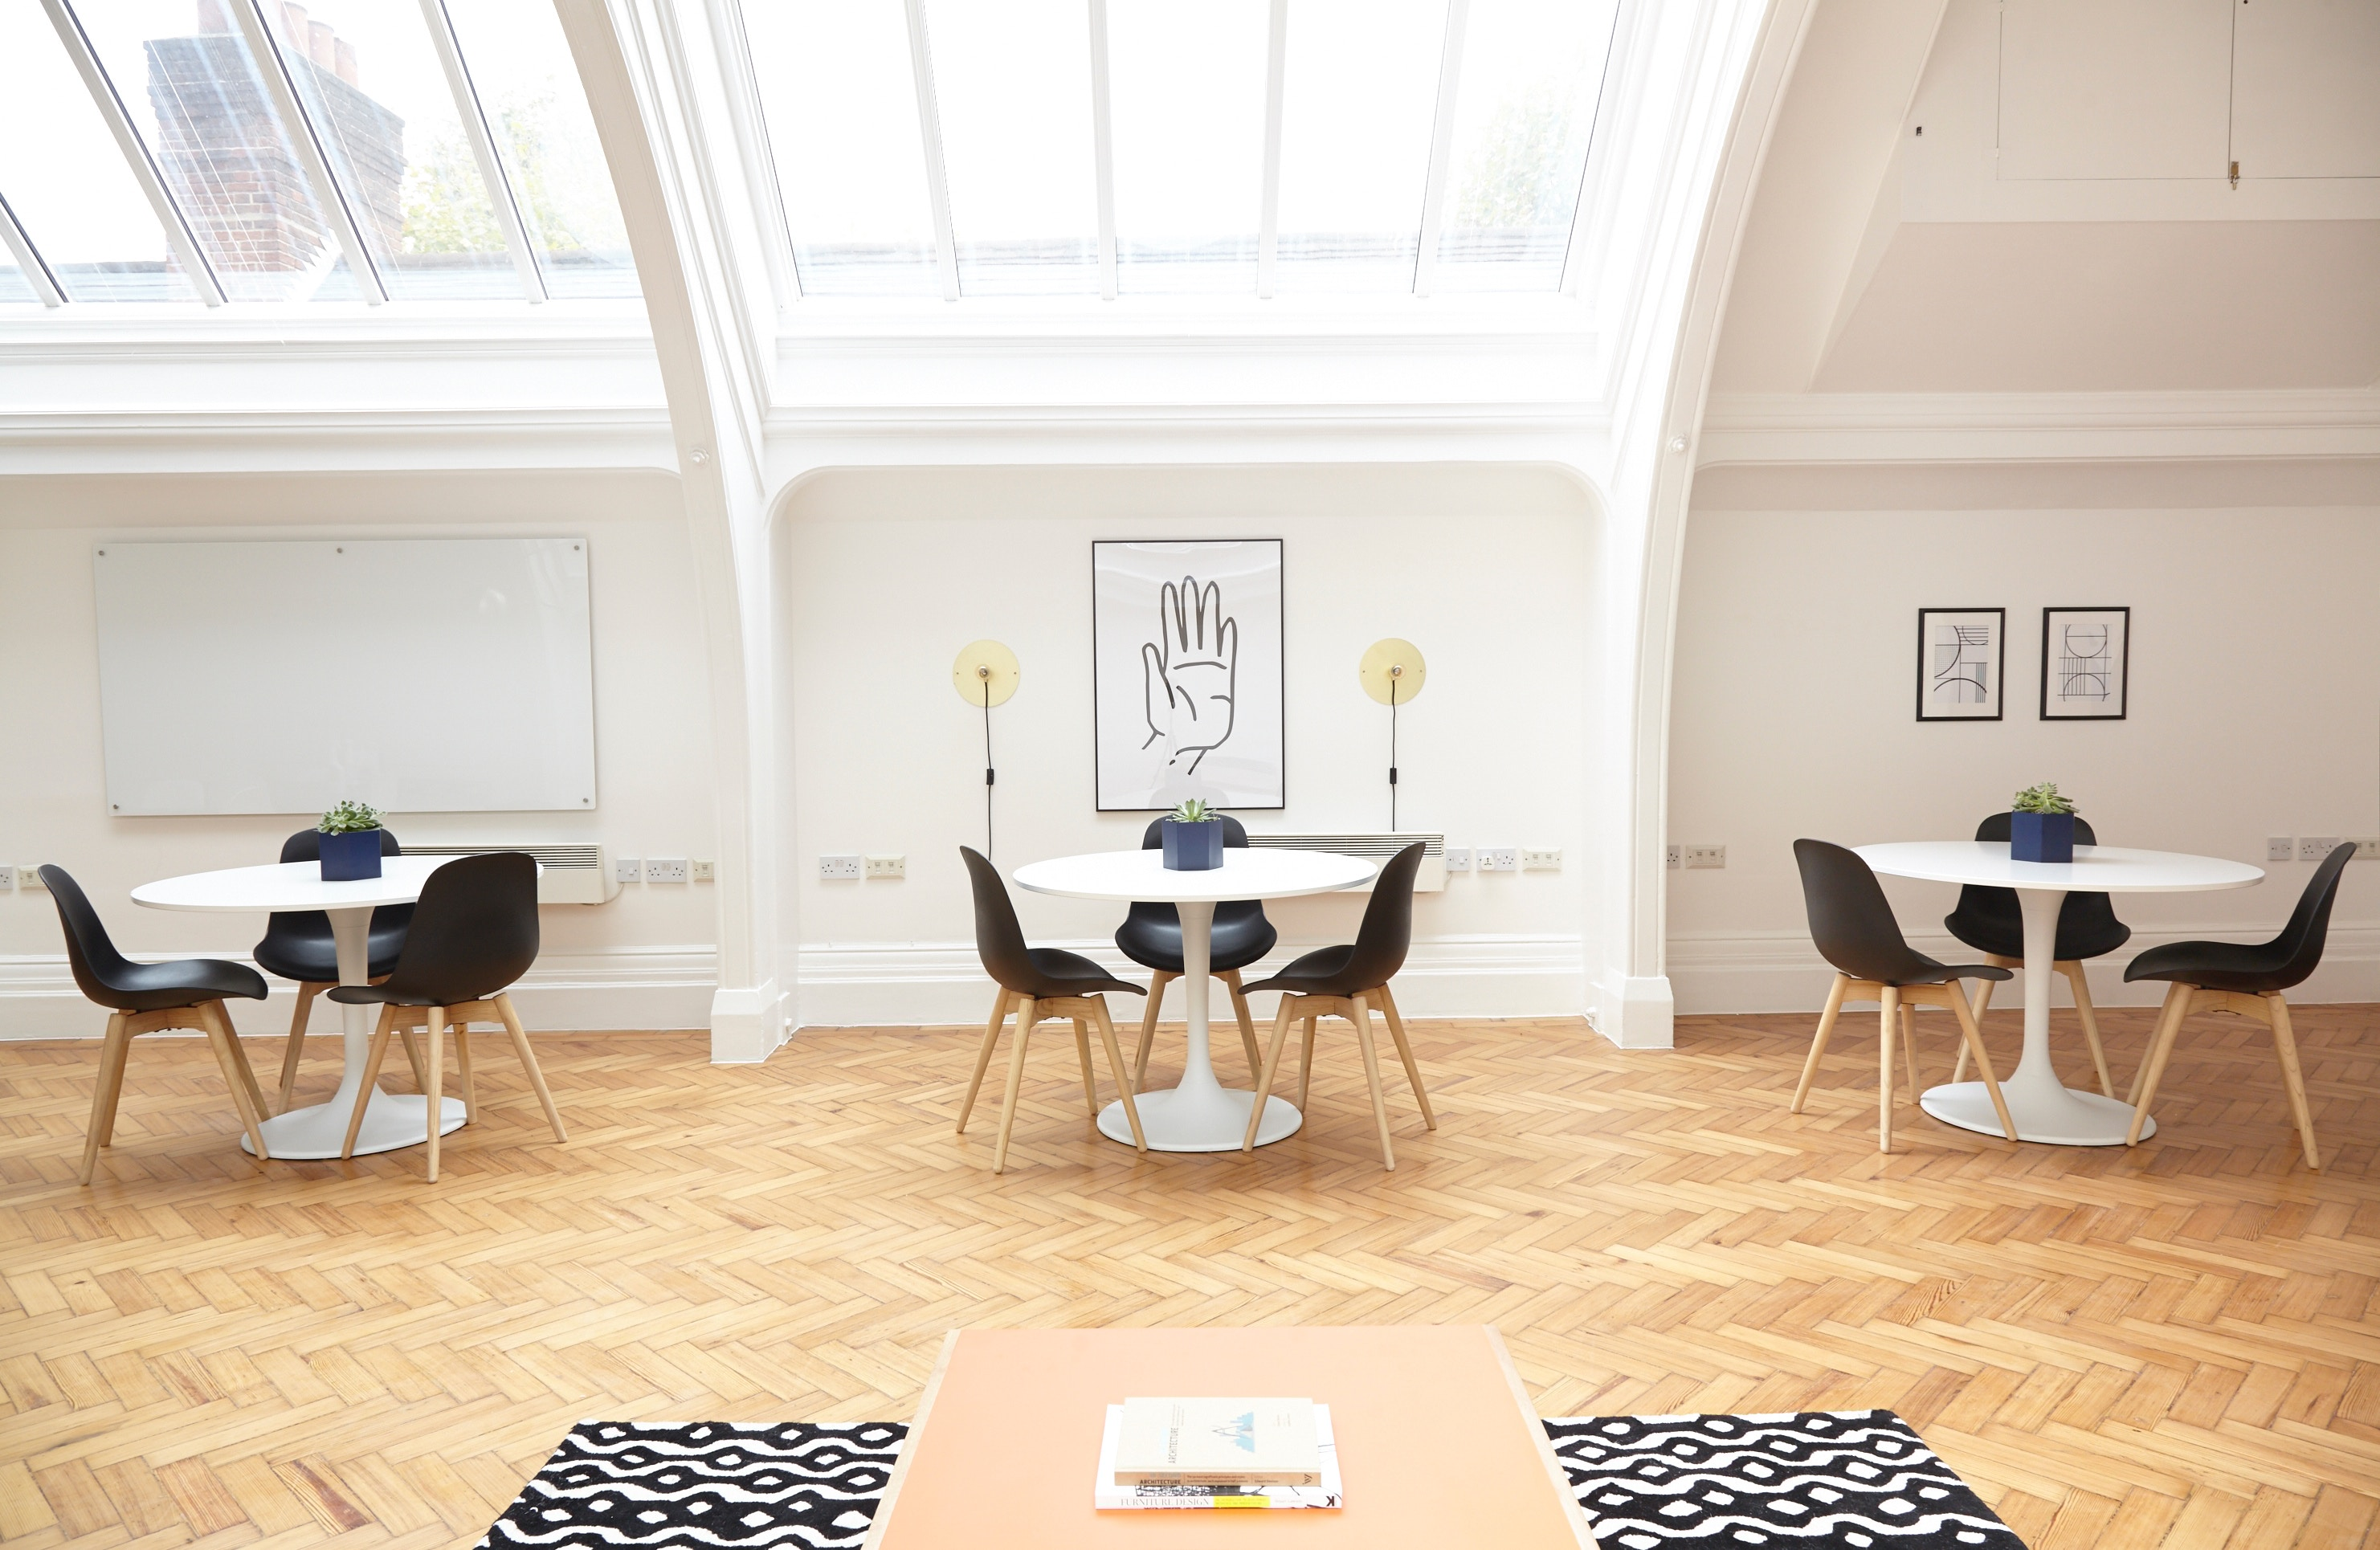 ikk vertrag s dwestdeutscher augenoptiker verband. Black Bedroom Furniture Sets. Home Design Ideas